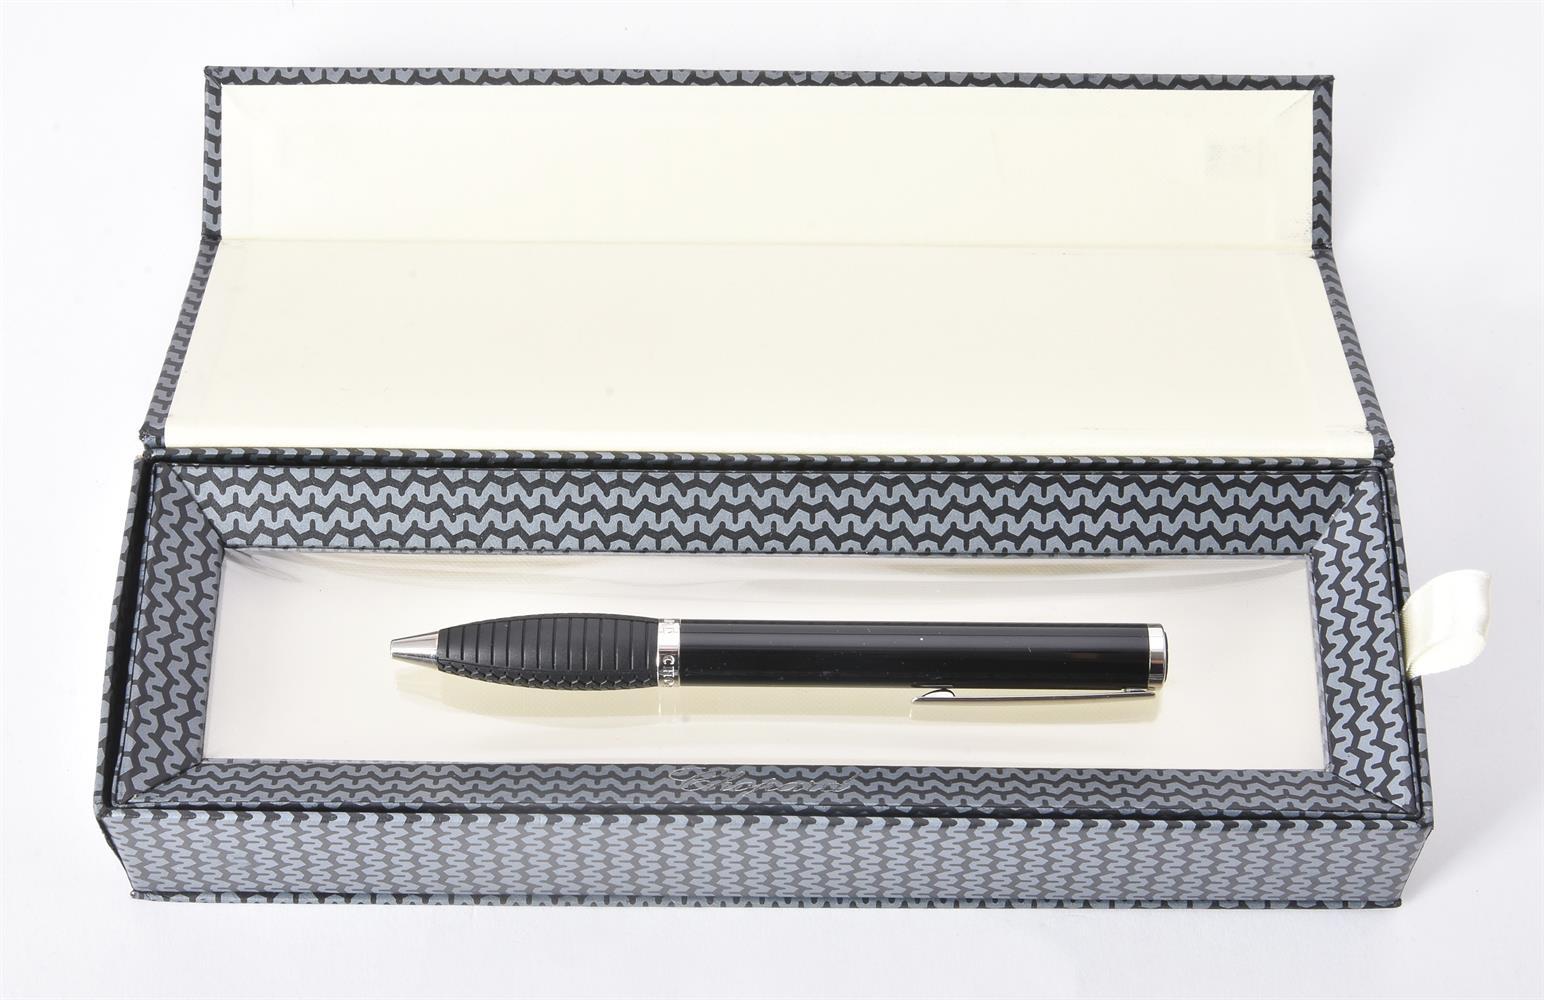 Chopard, Racing, ref. 95013-0001, a black resin and palladium ballpoint pen